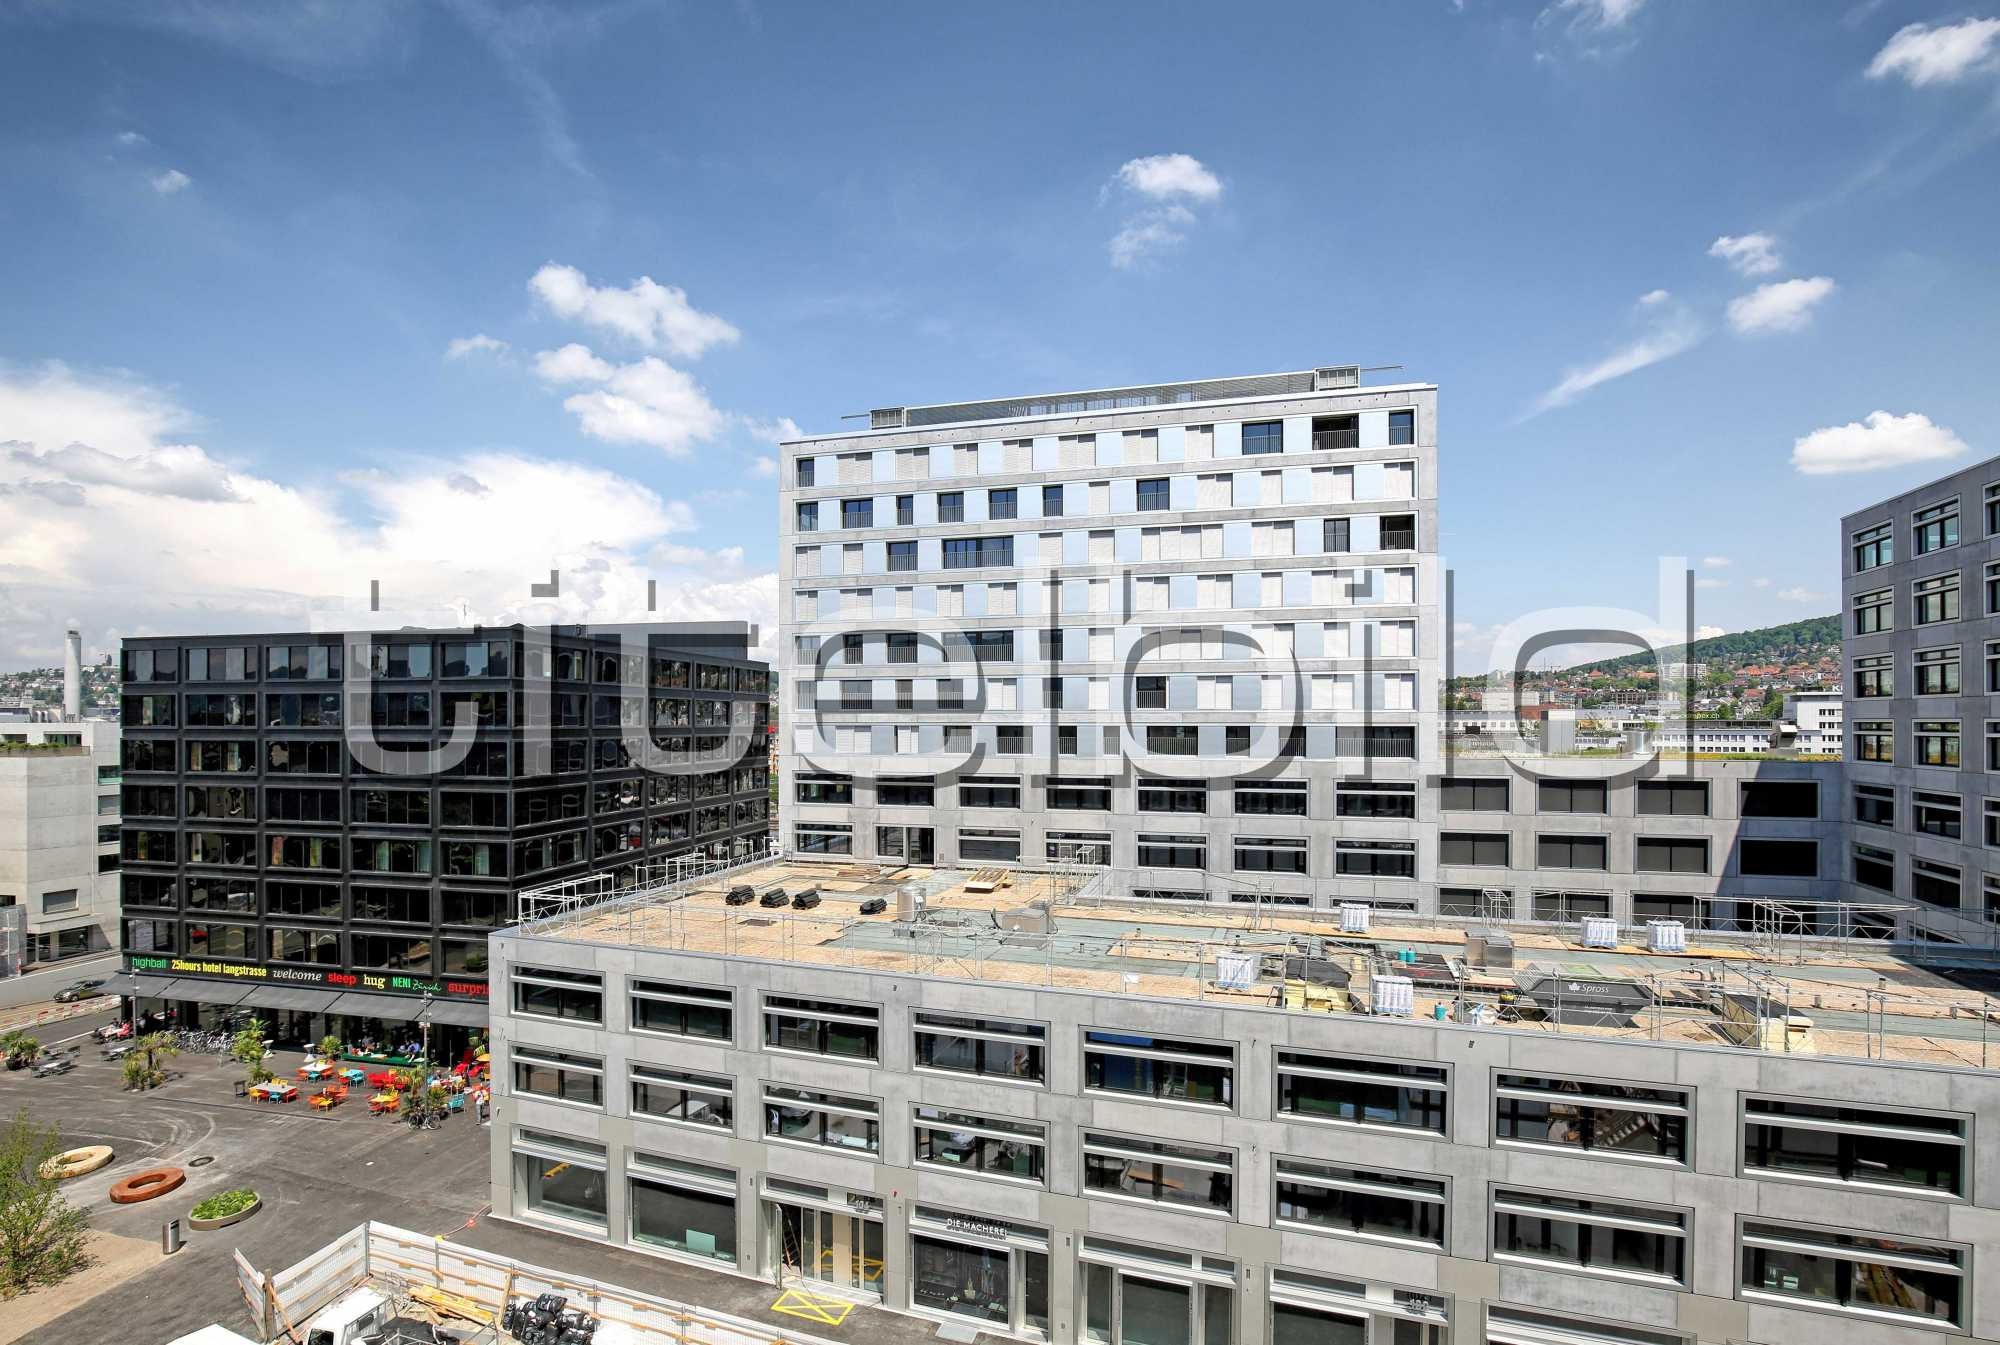 Projektbild-Nr. 1: Europaallee Haus H, 25hours hotel, GUSTAV Residenz